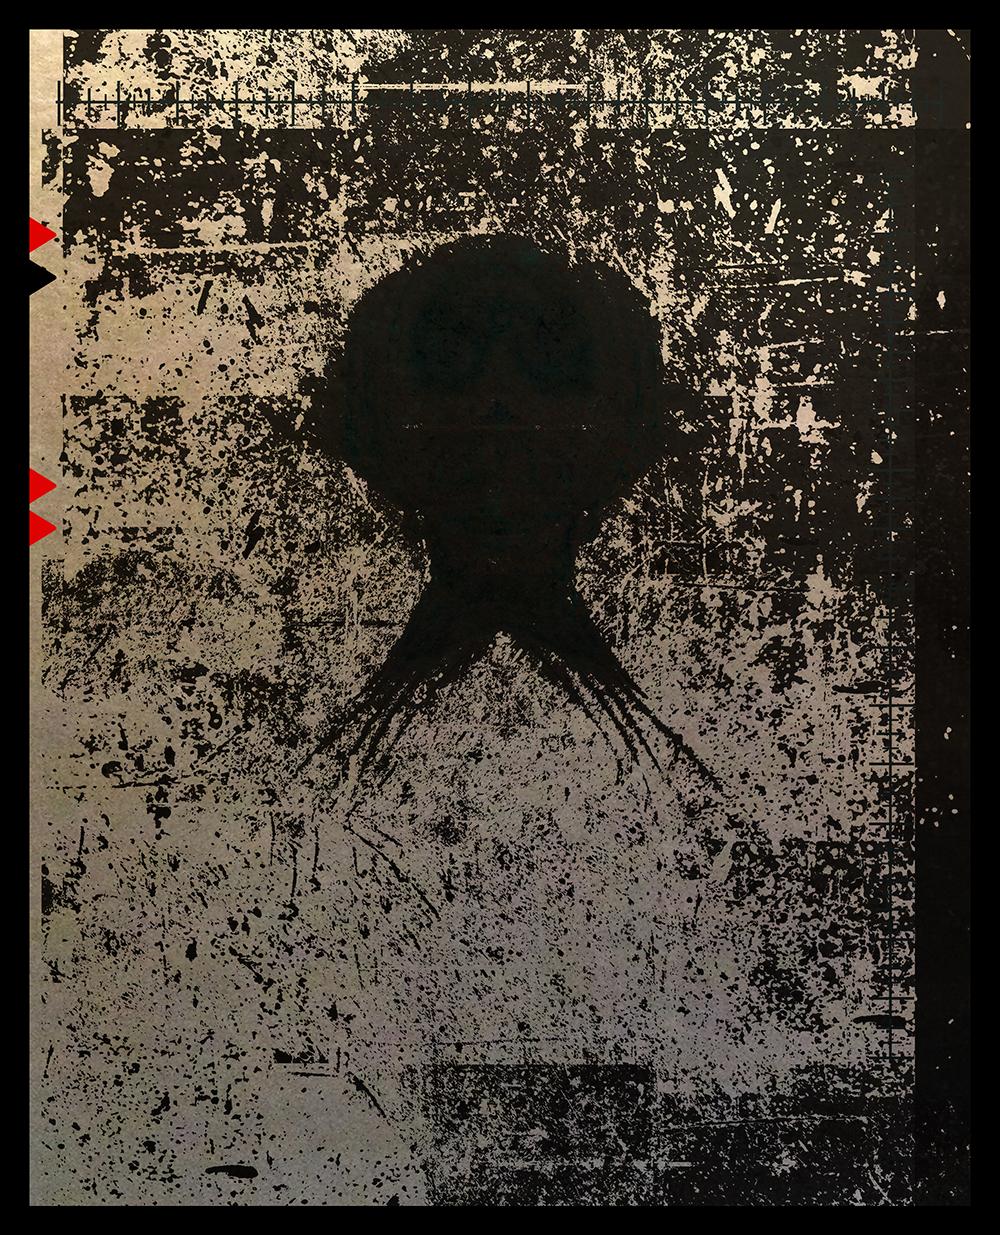 CRINI-silhouettes-12.png